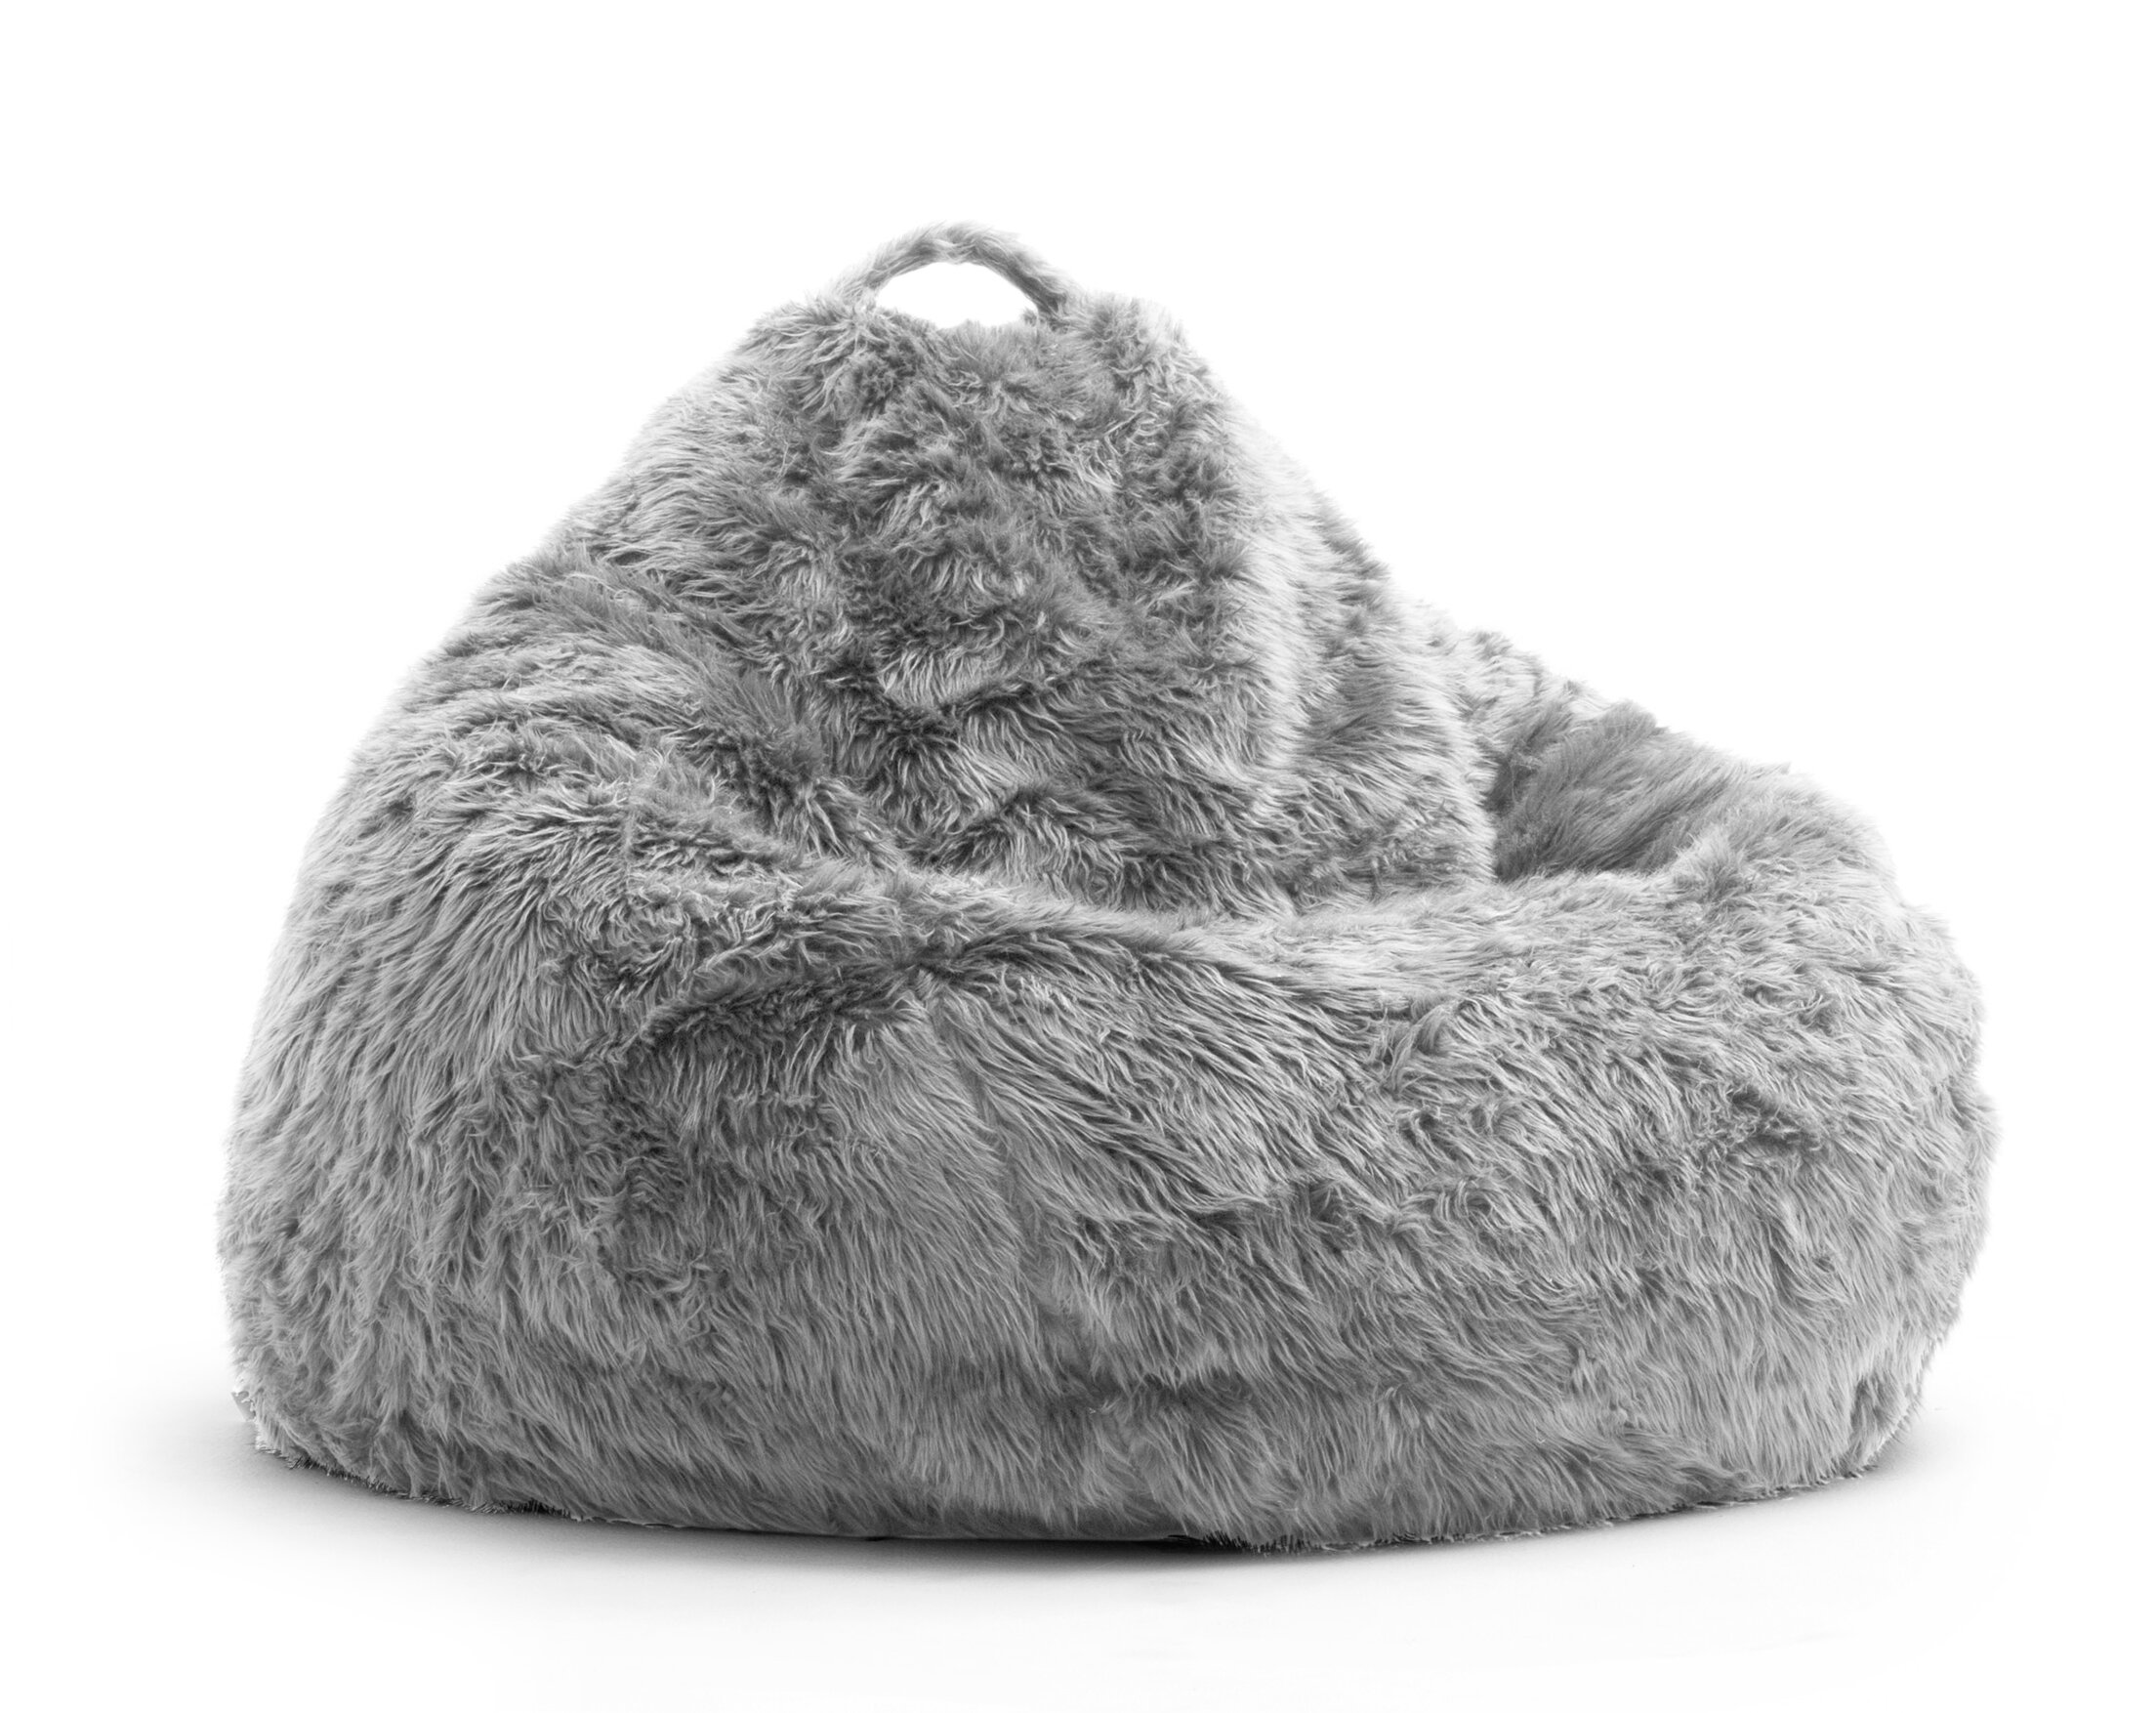 988fd7c0c6c7 Comfort Research Big Joe Teardrop Bean Bag Chair   Reviews